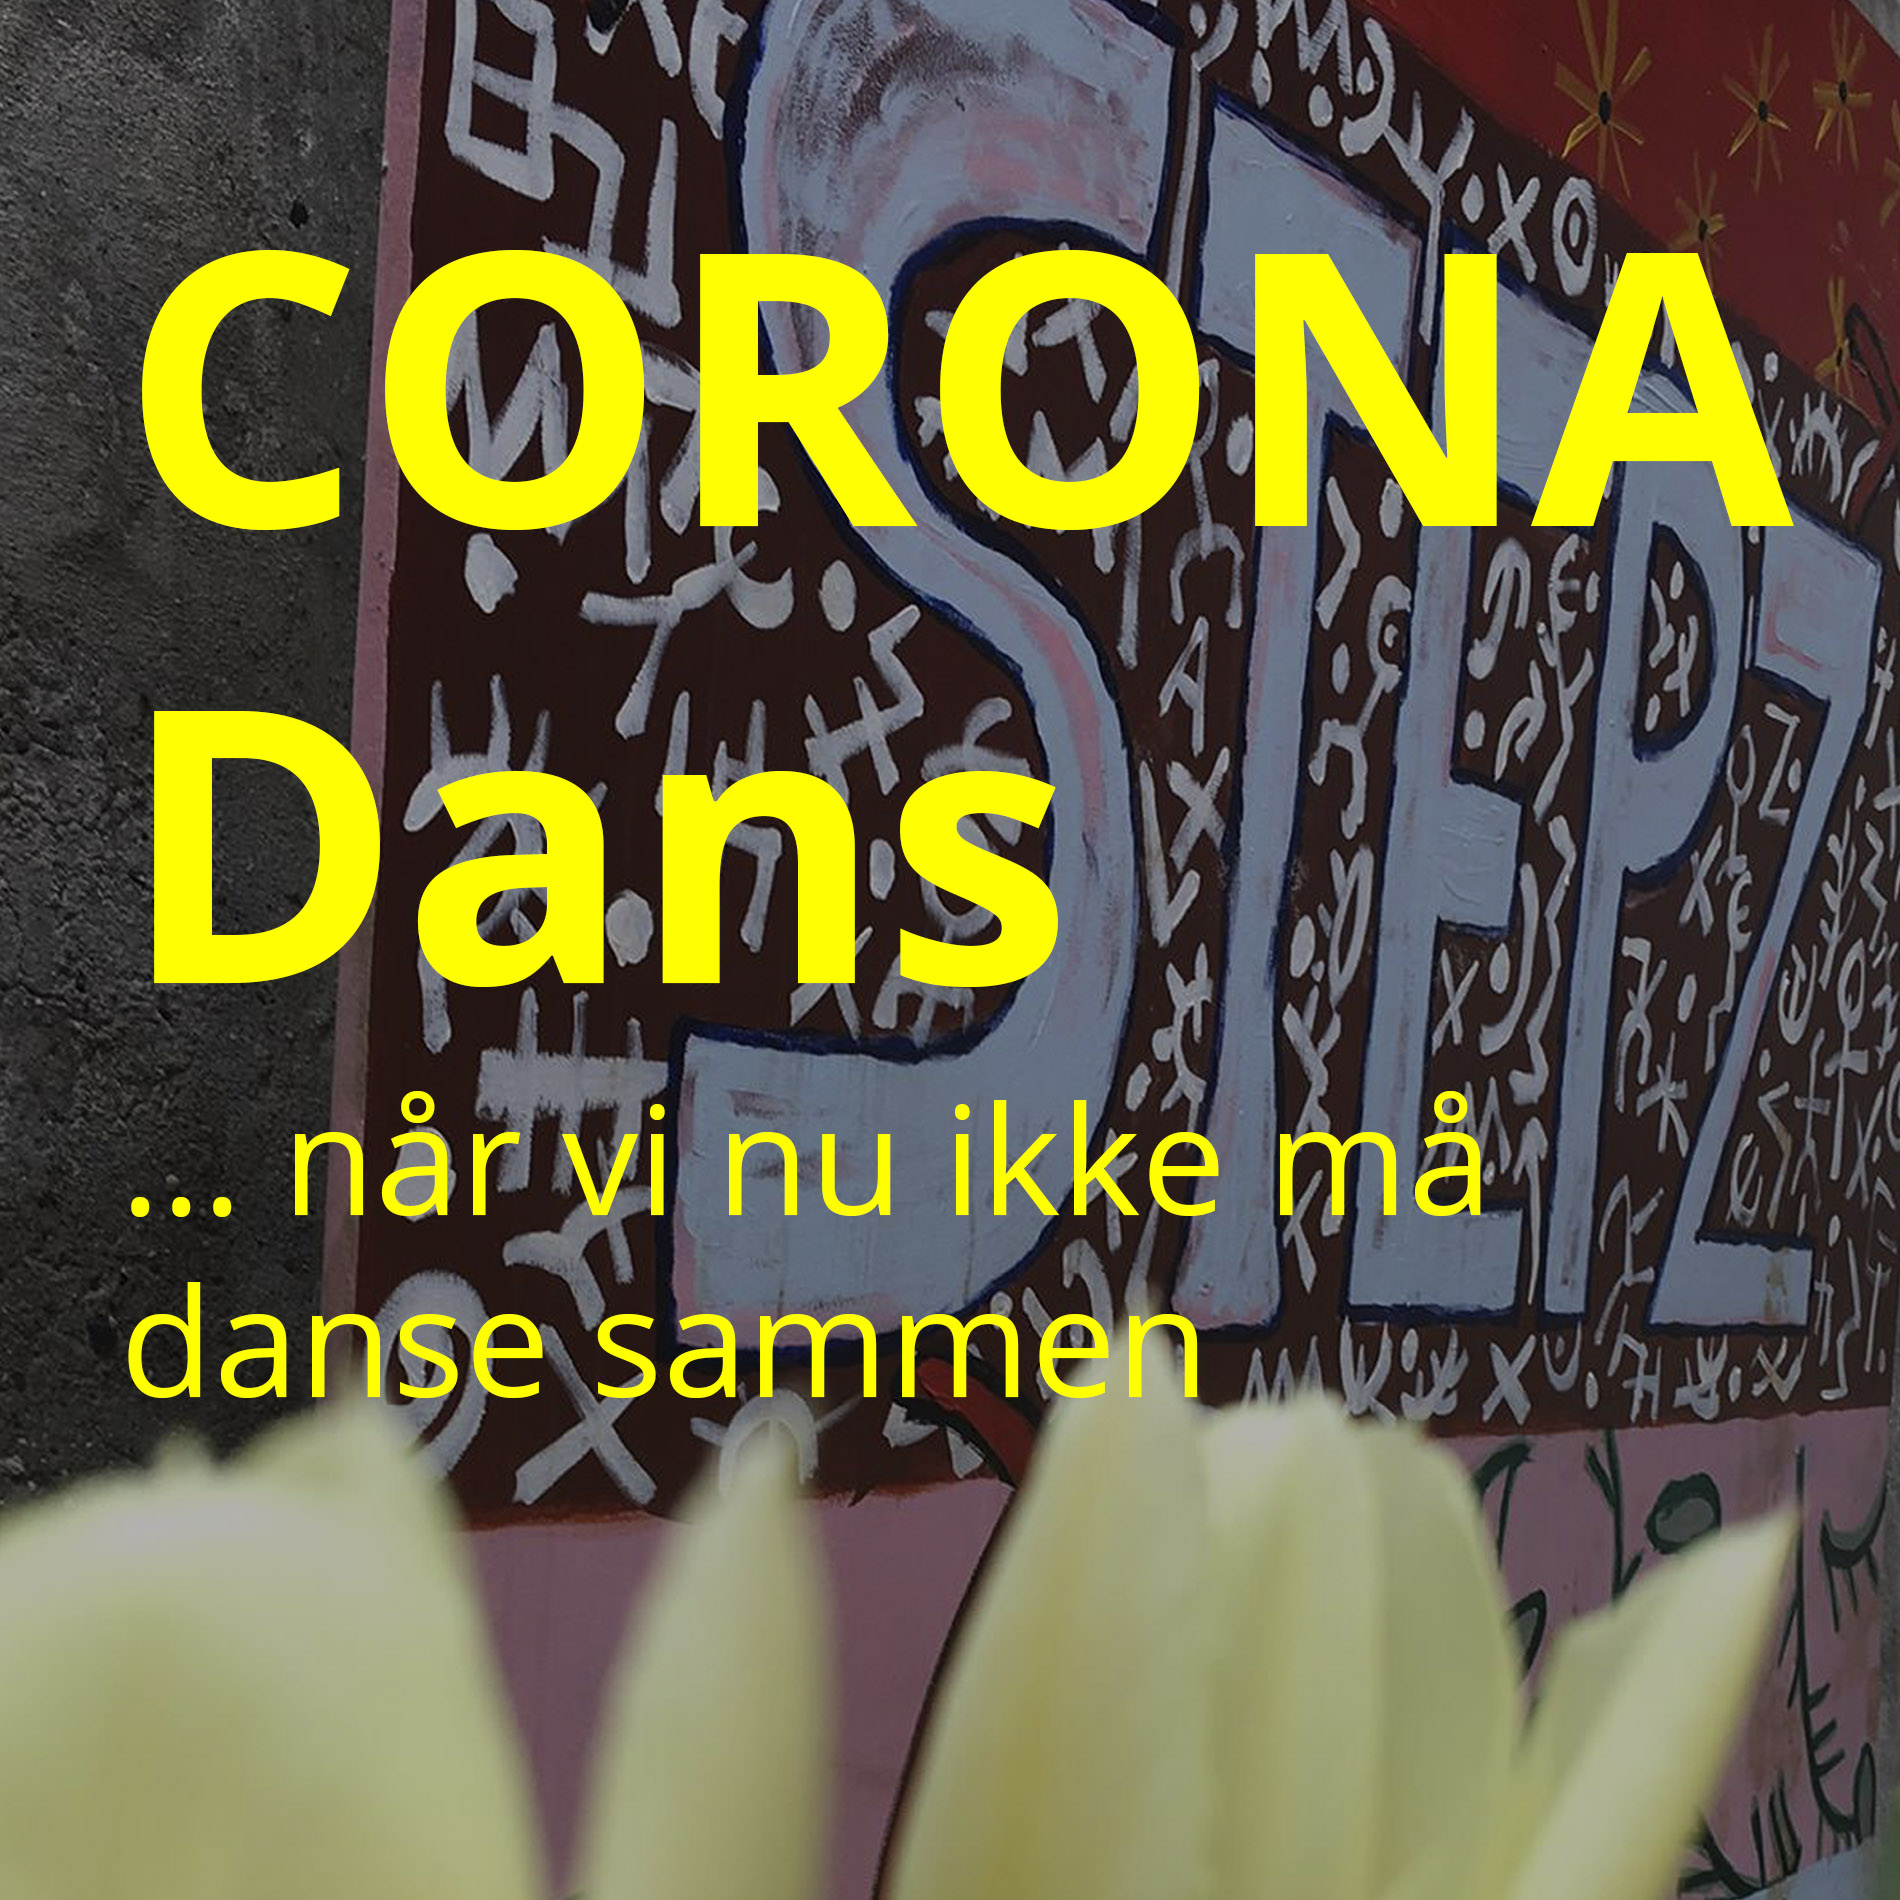 Corona Dans